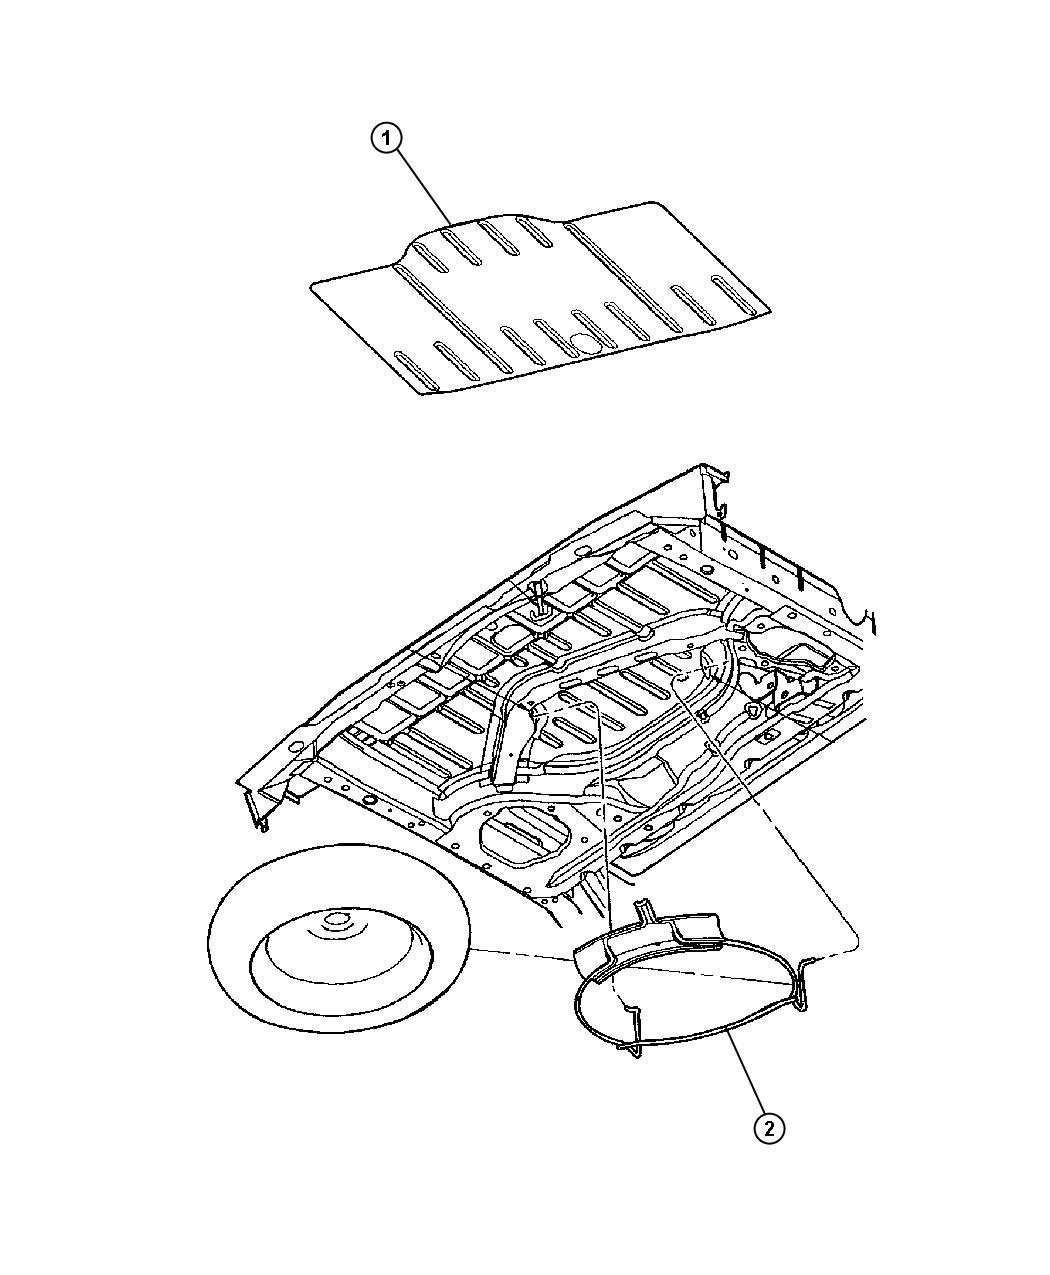 Chrysler Pt Cruiser Hook Spare Tire Attach